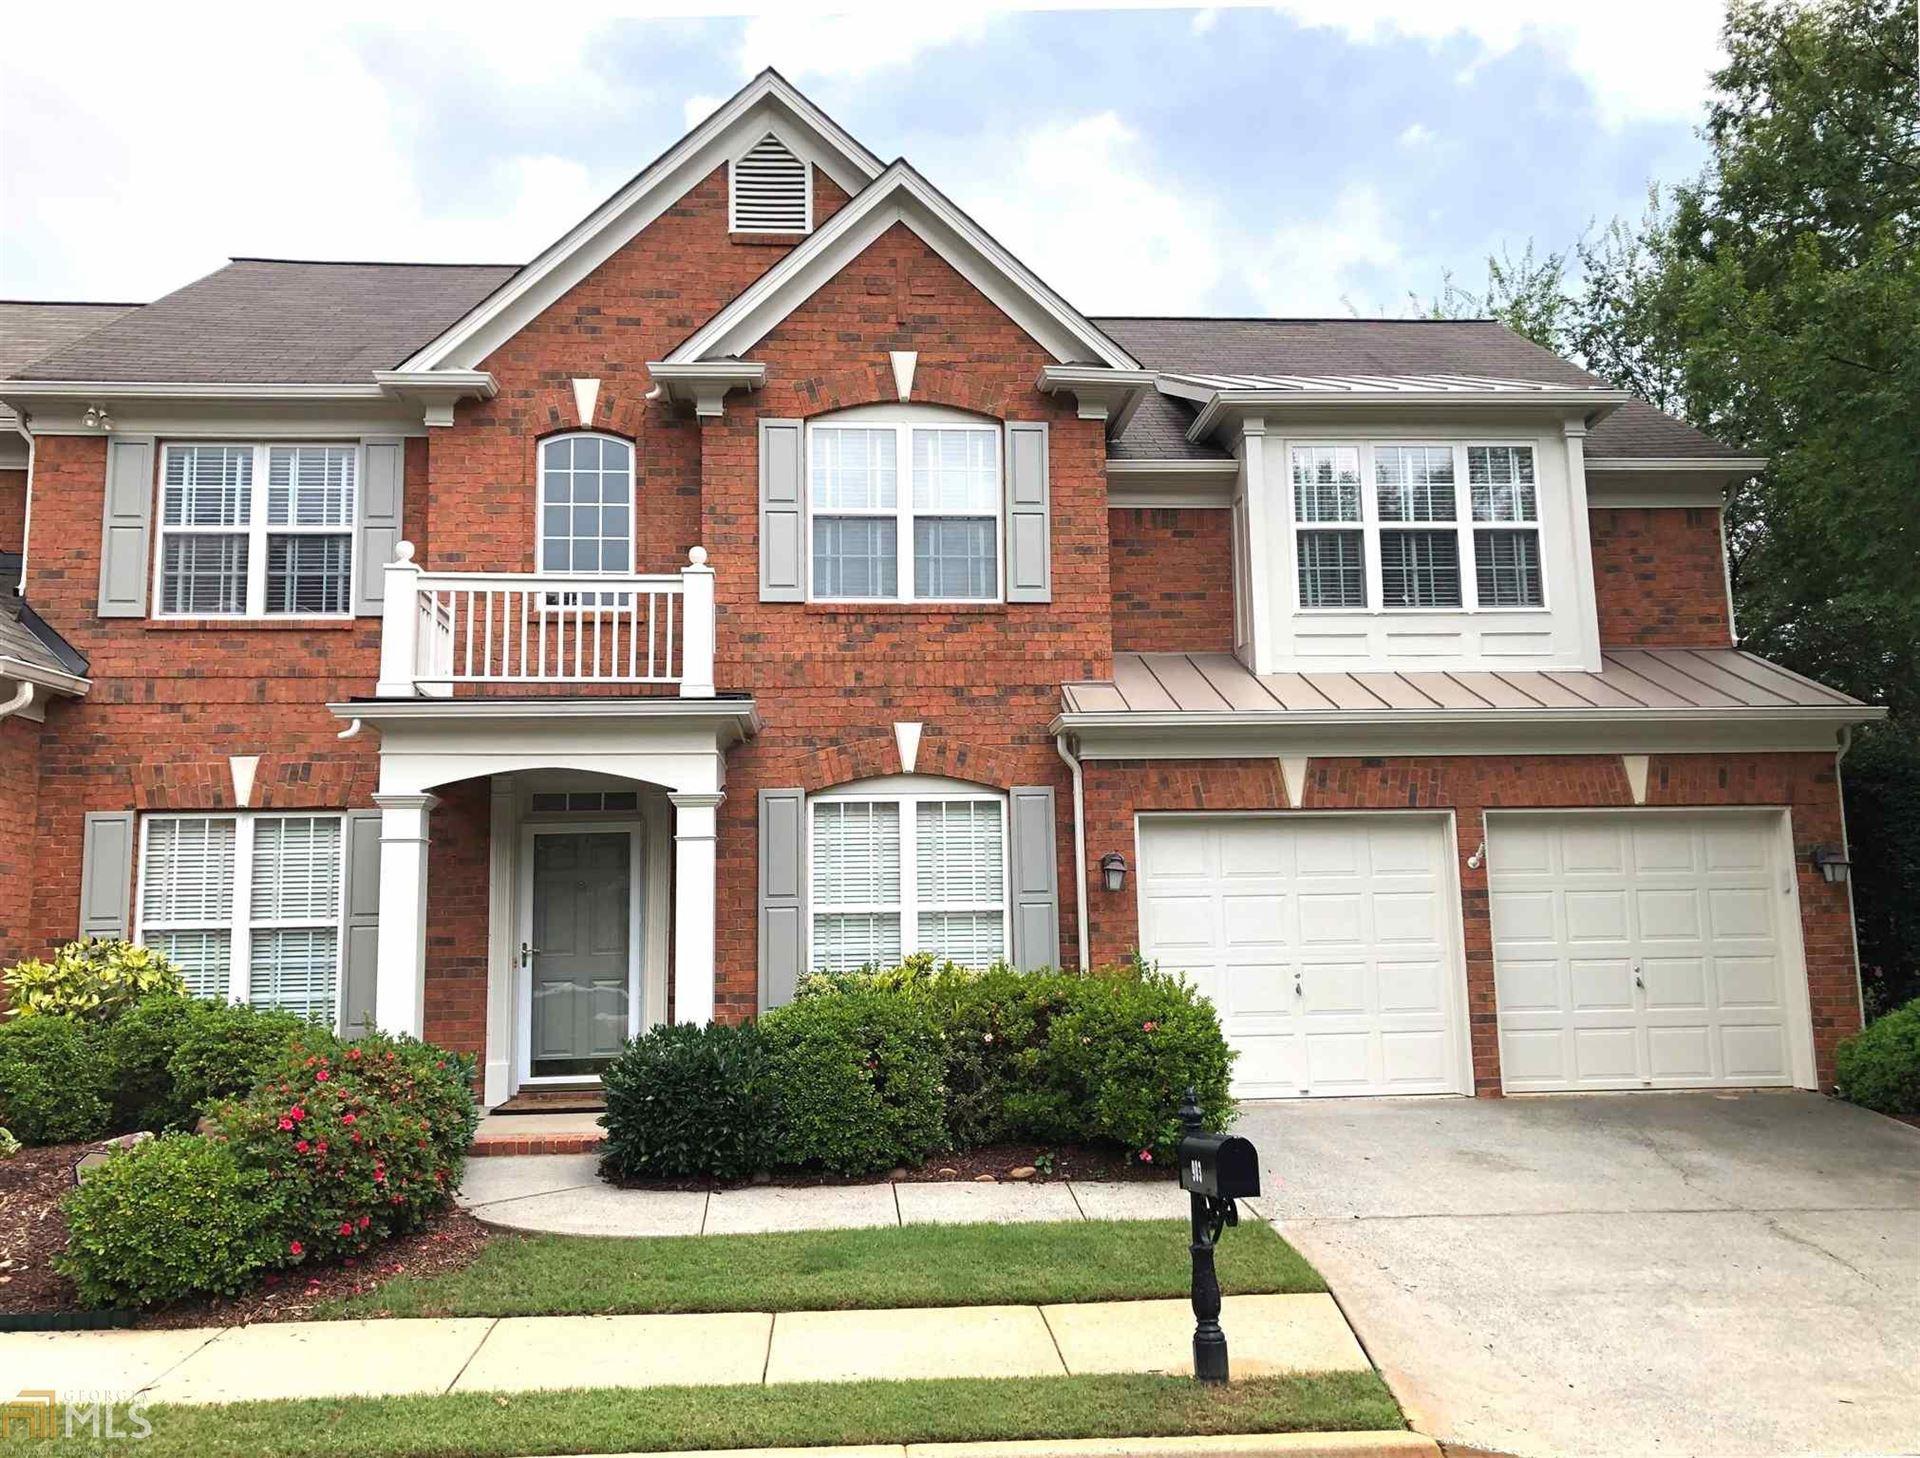 903 Thornington Pl, Roswell, GA 30075 - MLS#: 8844535